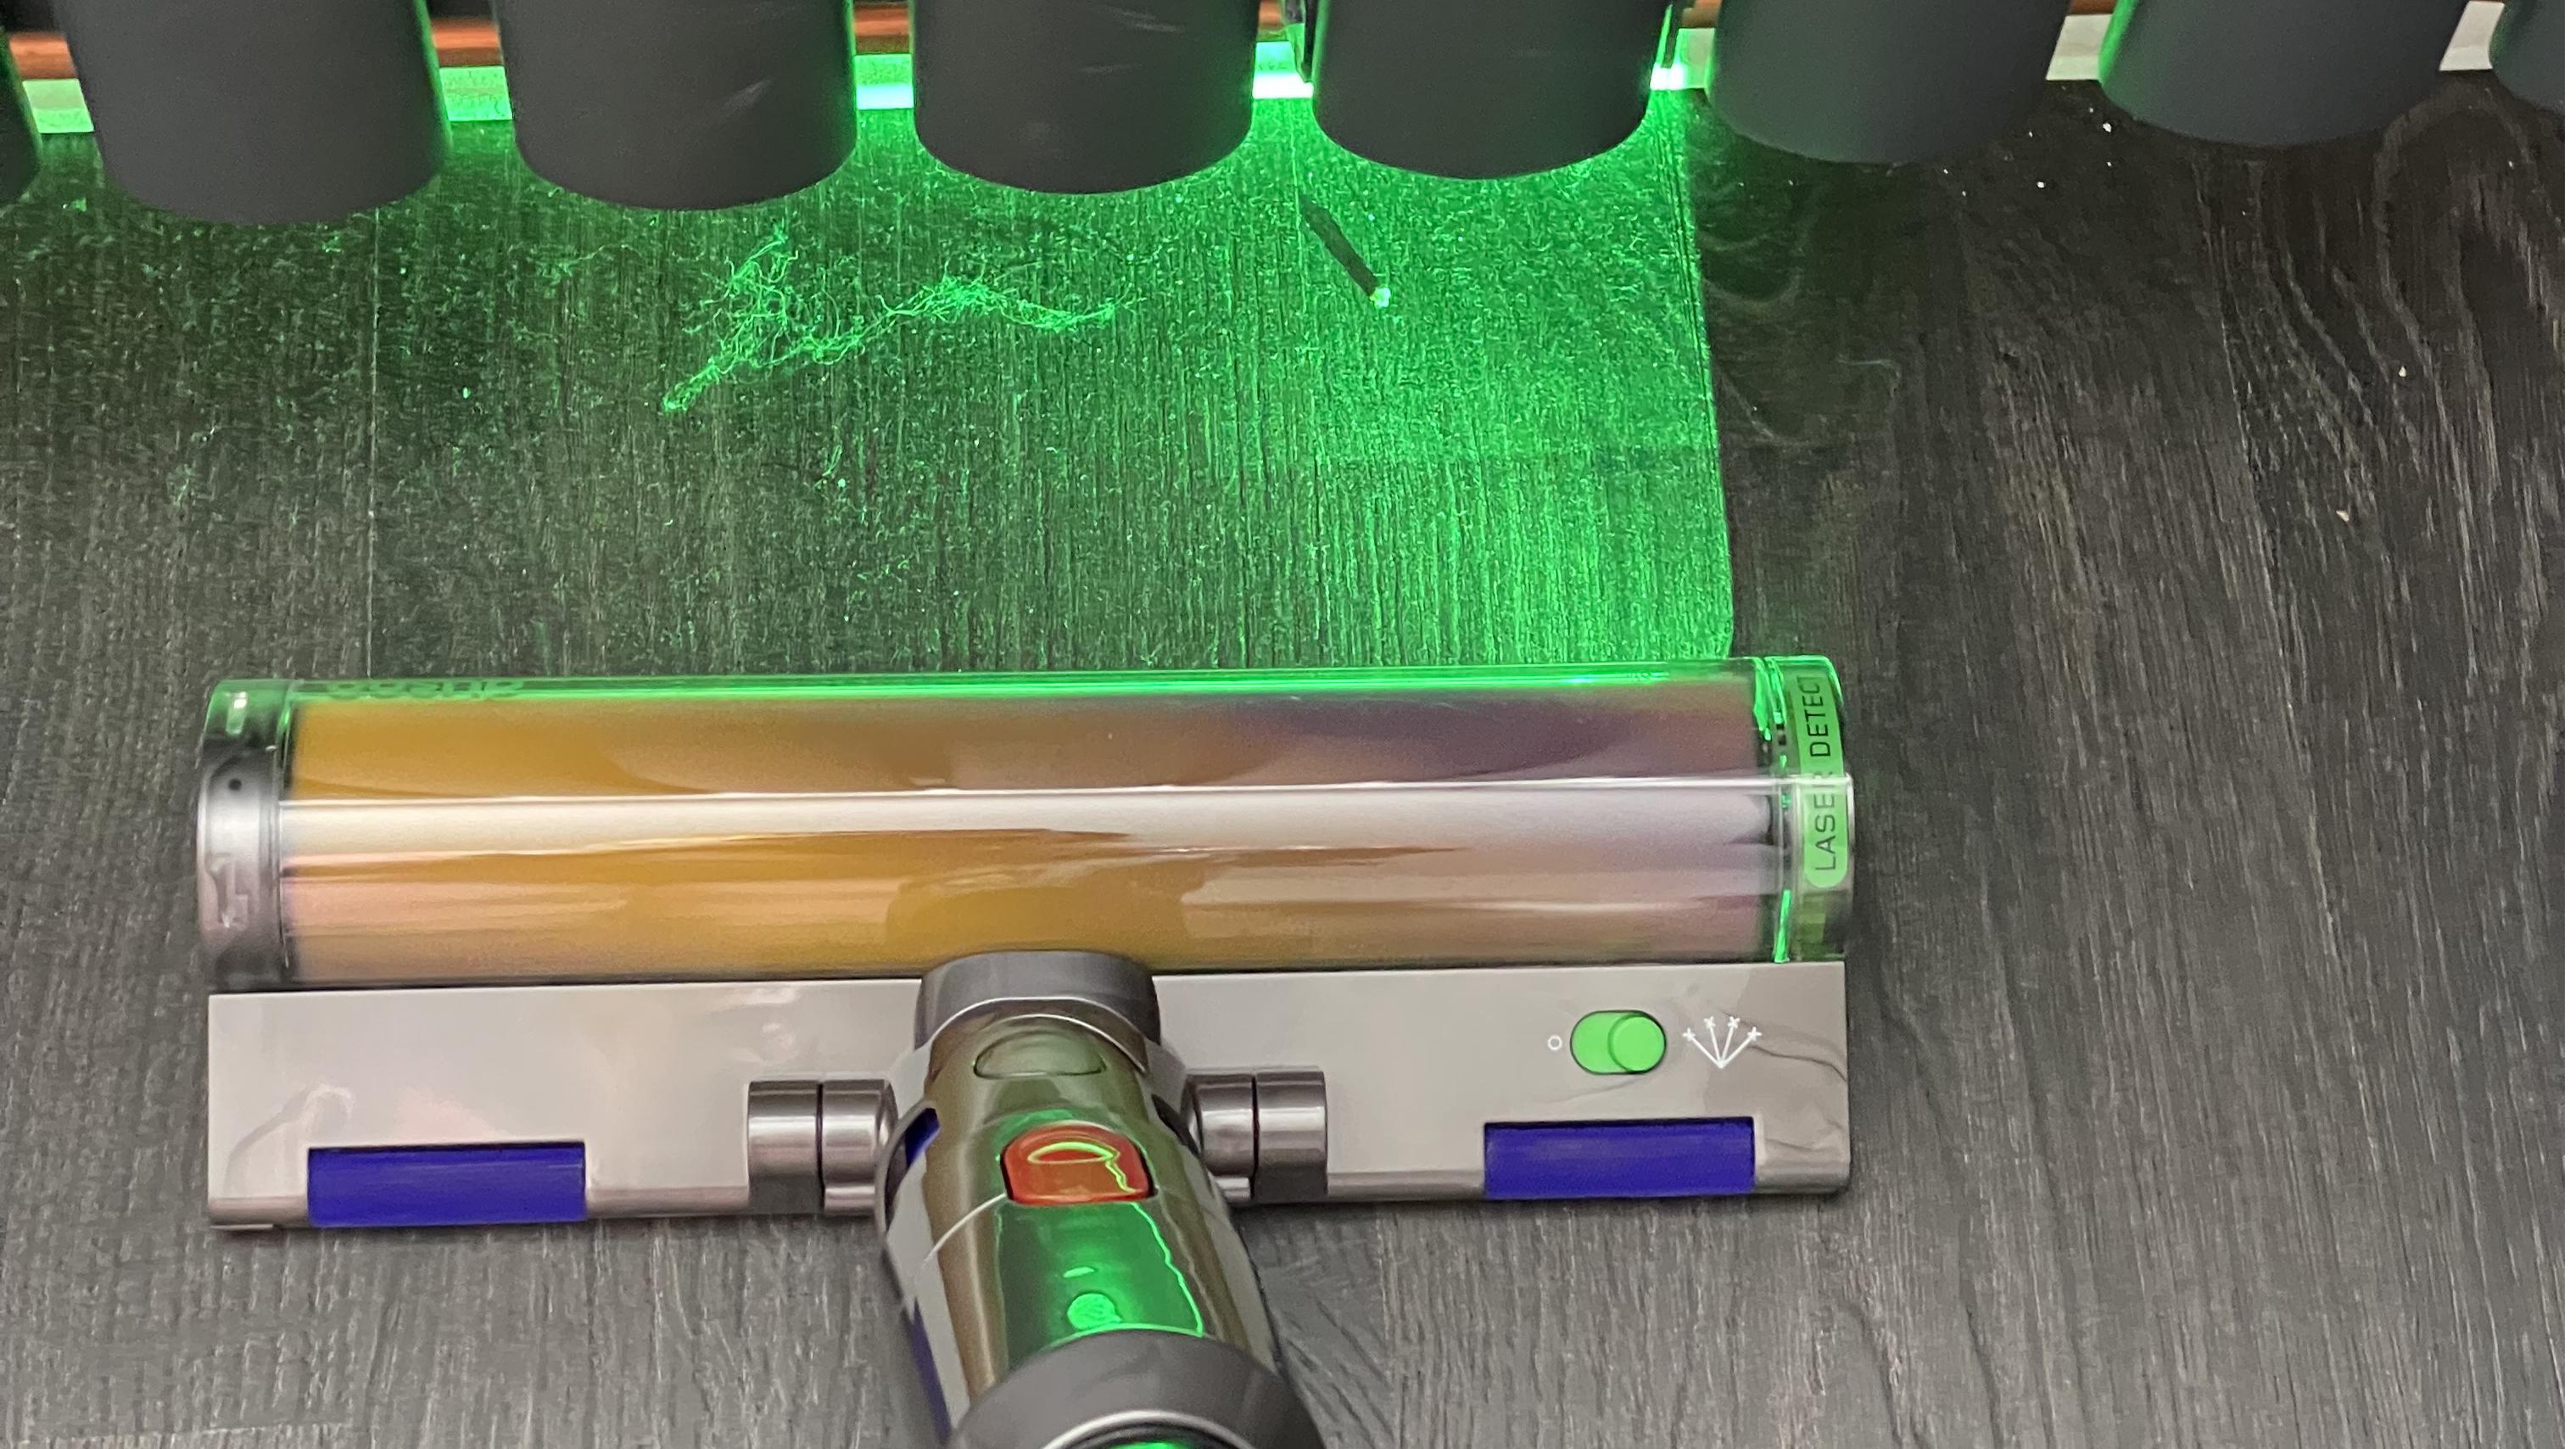 Dyson V15 Detect's Laser Slim Fluffy cleaning head